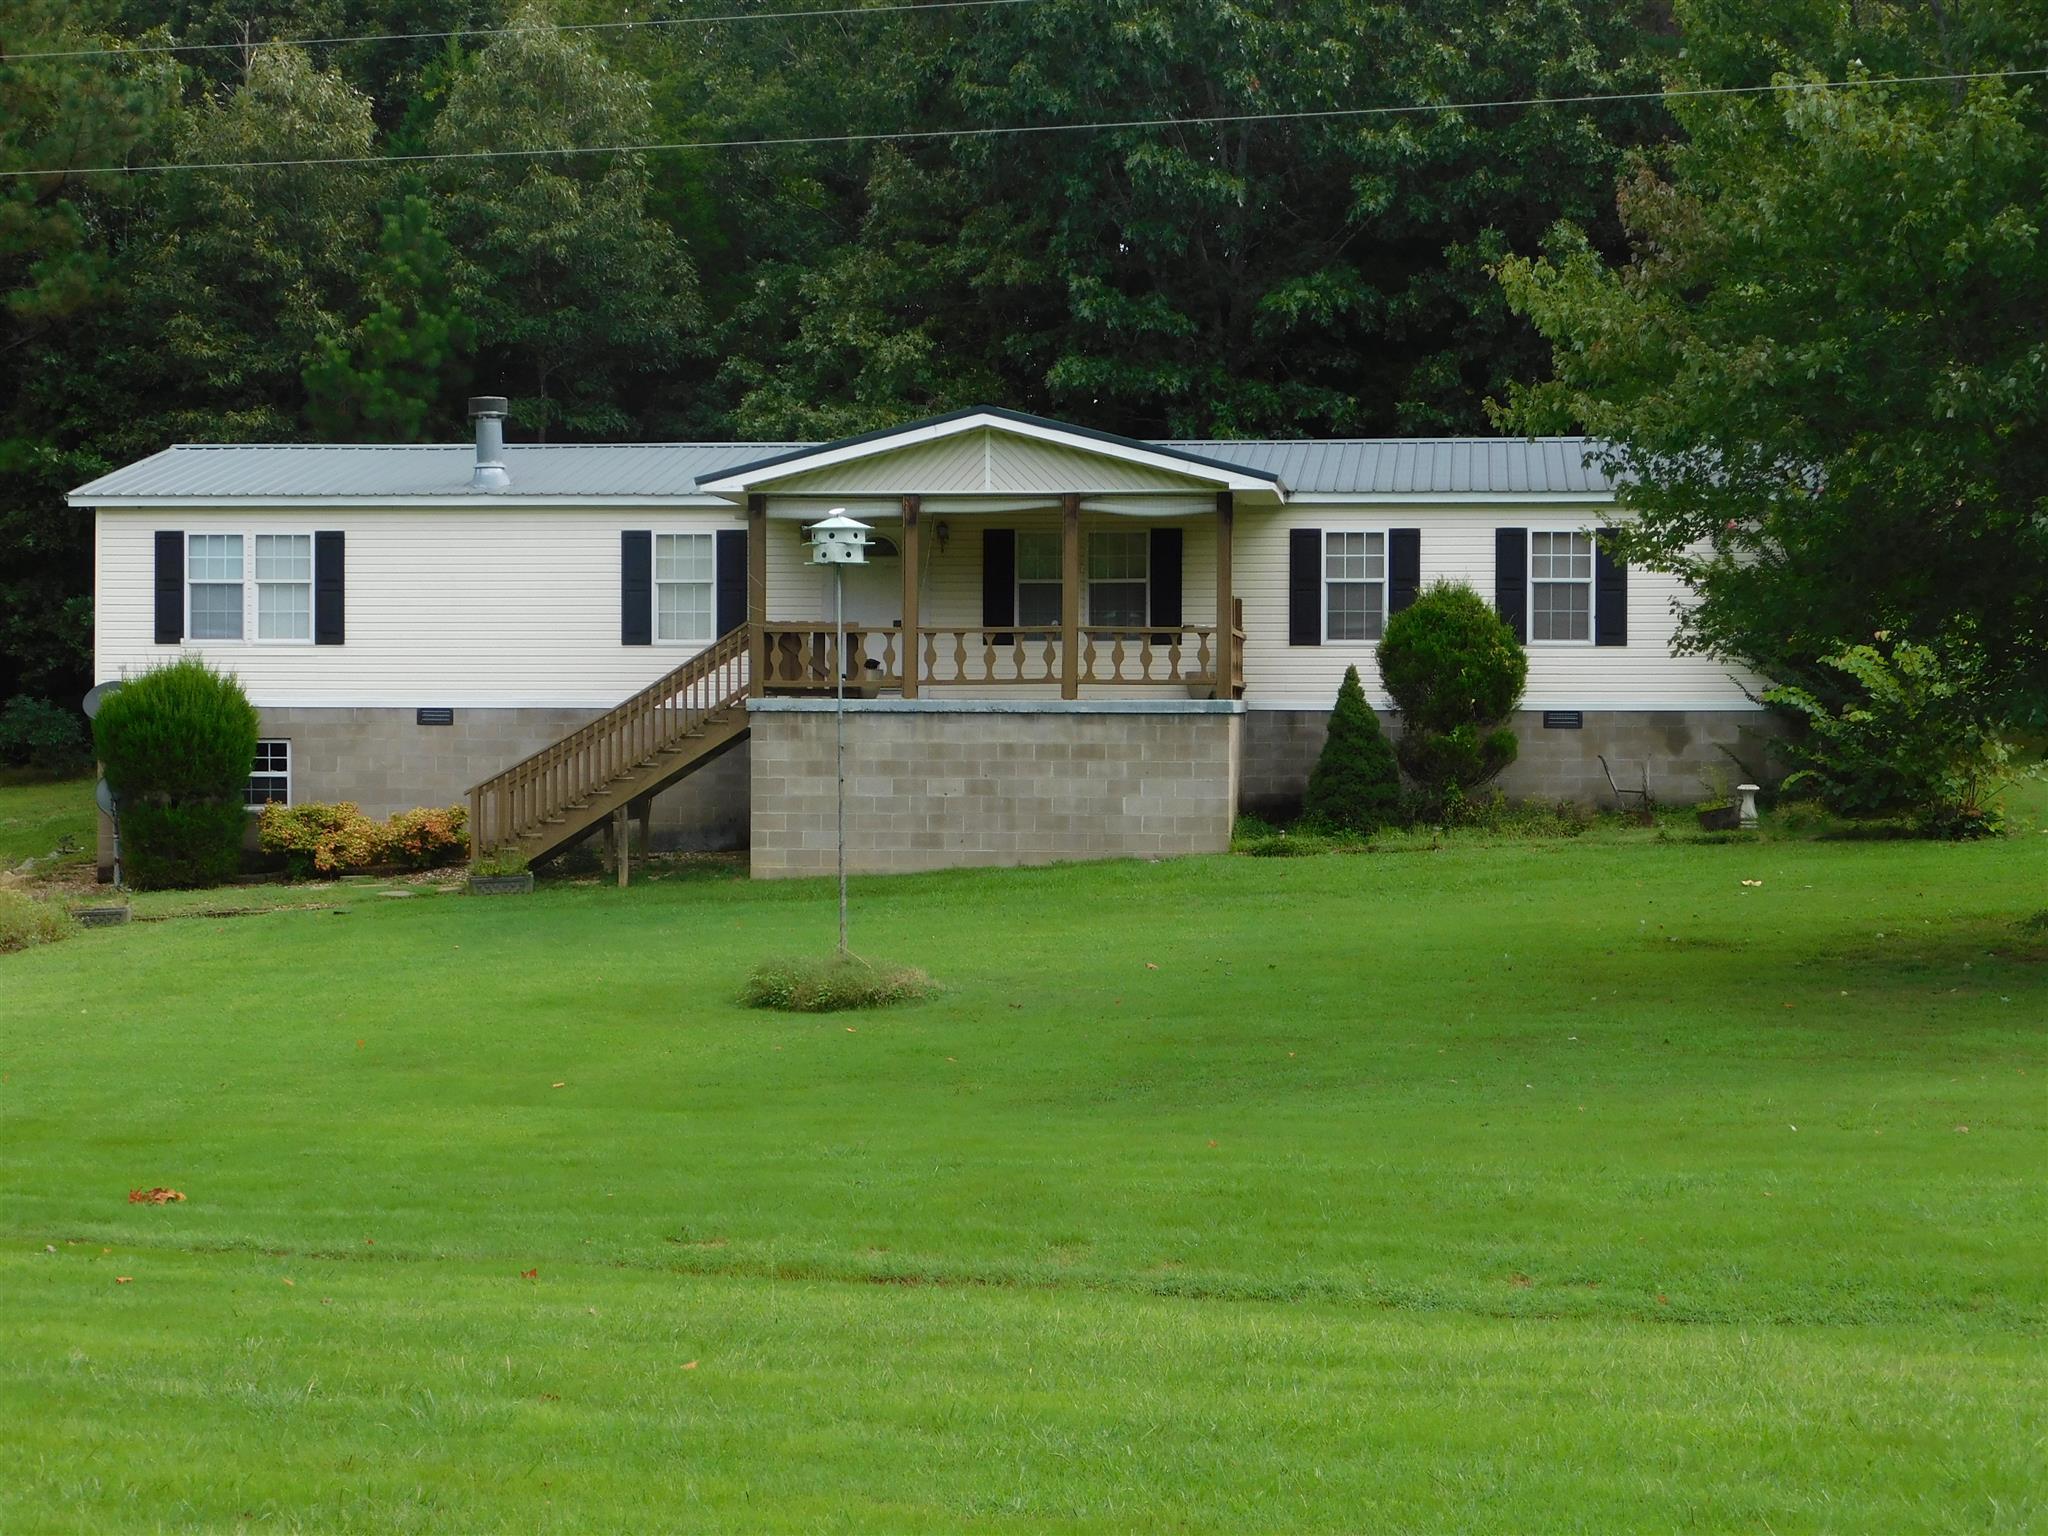 1230 Shiloh Church Rd, Camden, TN 38320 - Camden, TN real estate listing